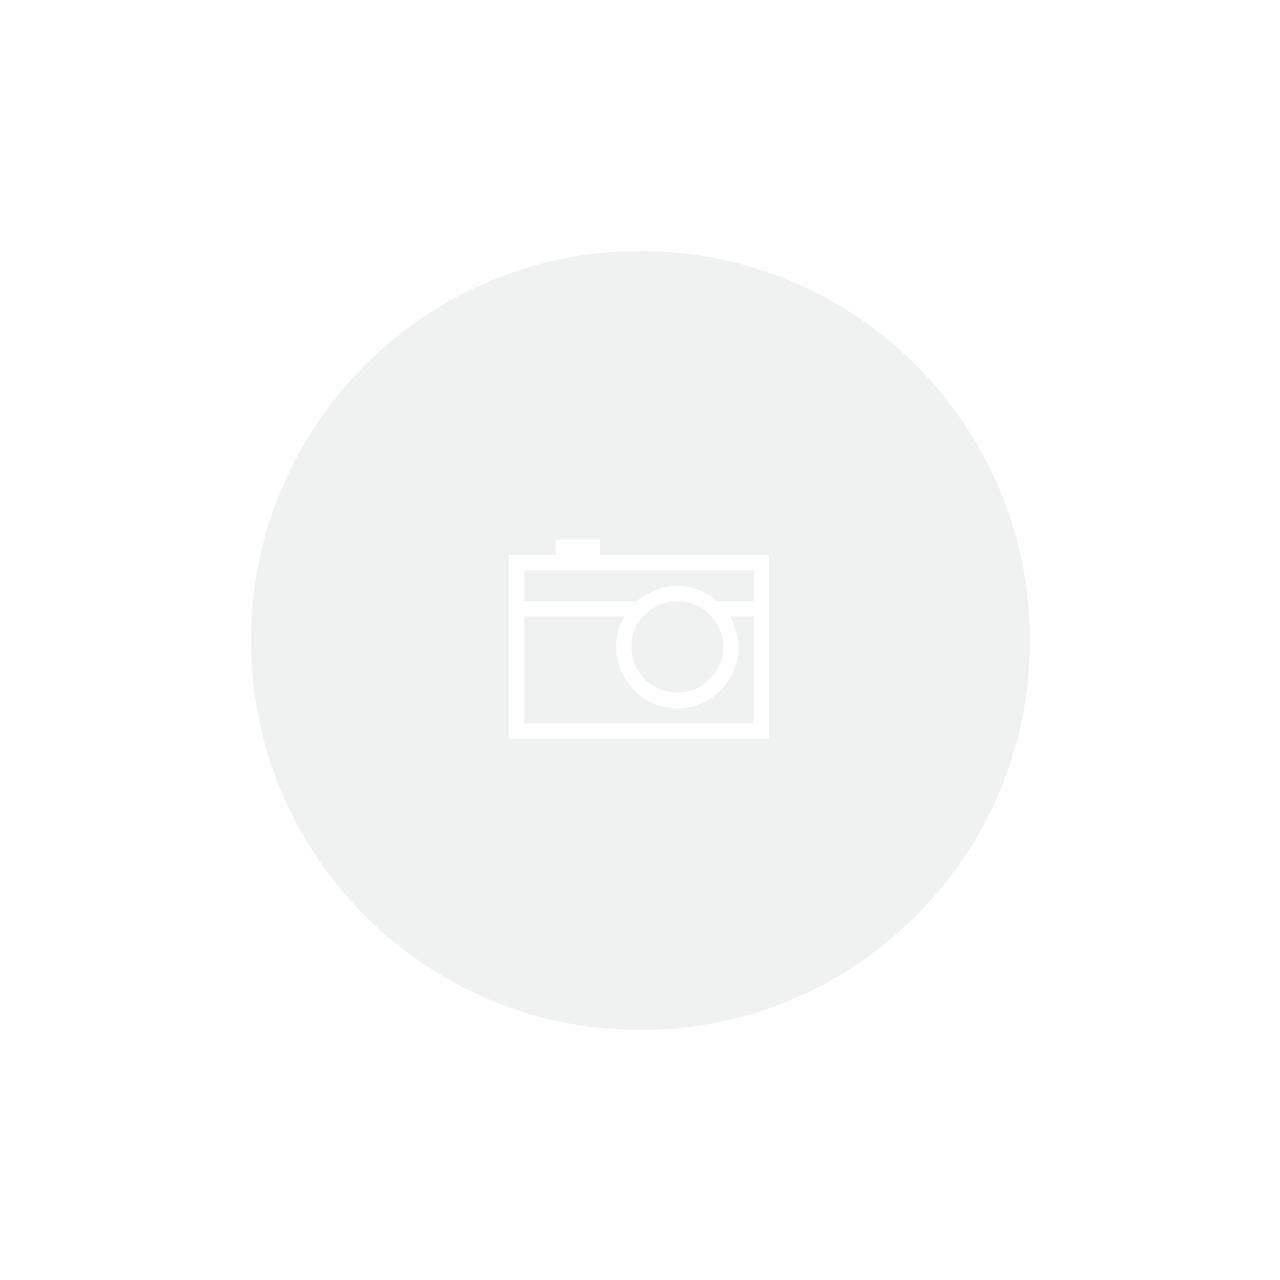 Fôrma para Torta e Bolo Antiaderente 26 cm Brasil Tramontina